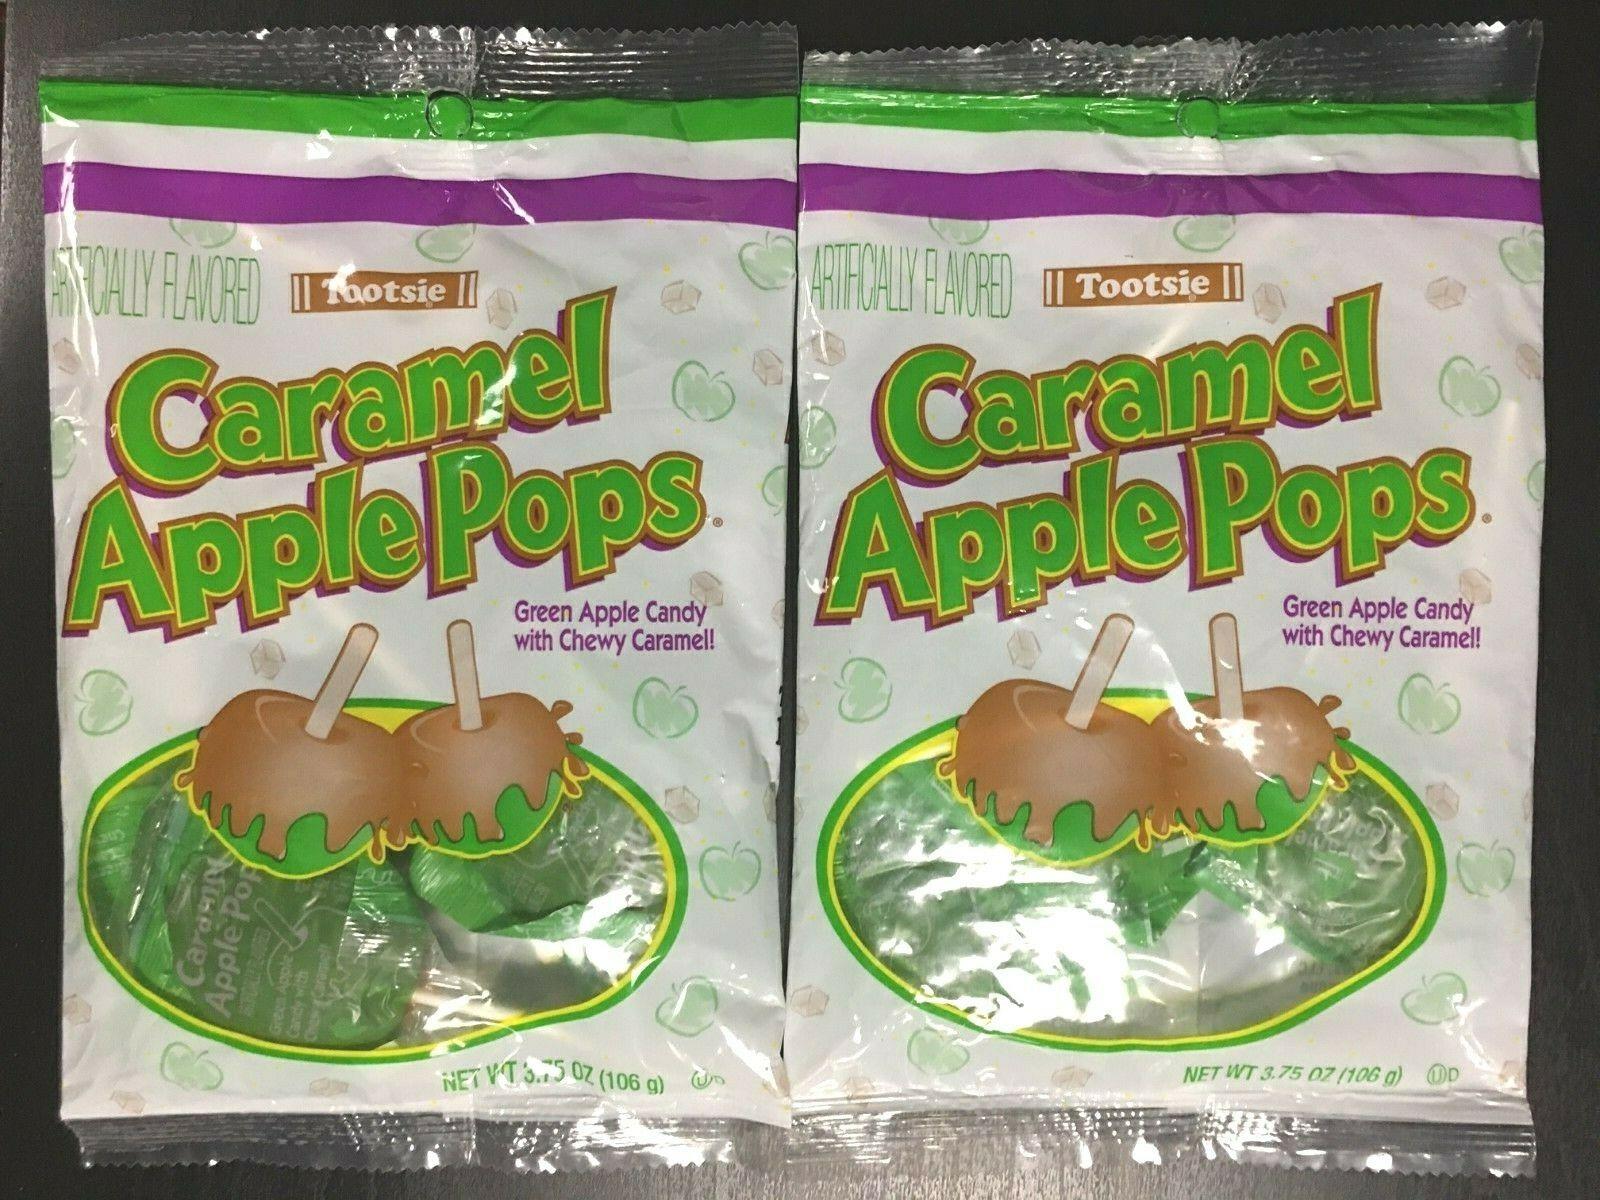 TWO SEALED Tootsie Caramel Green Apple Pops 3.75 fl oz/ 106g bags 12 Lollipops